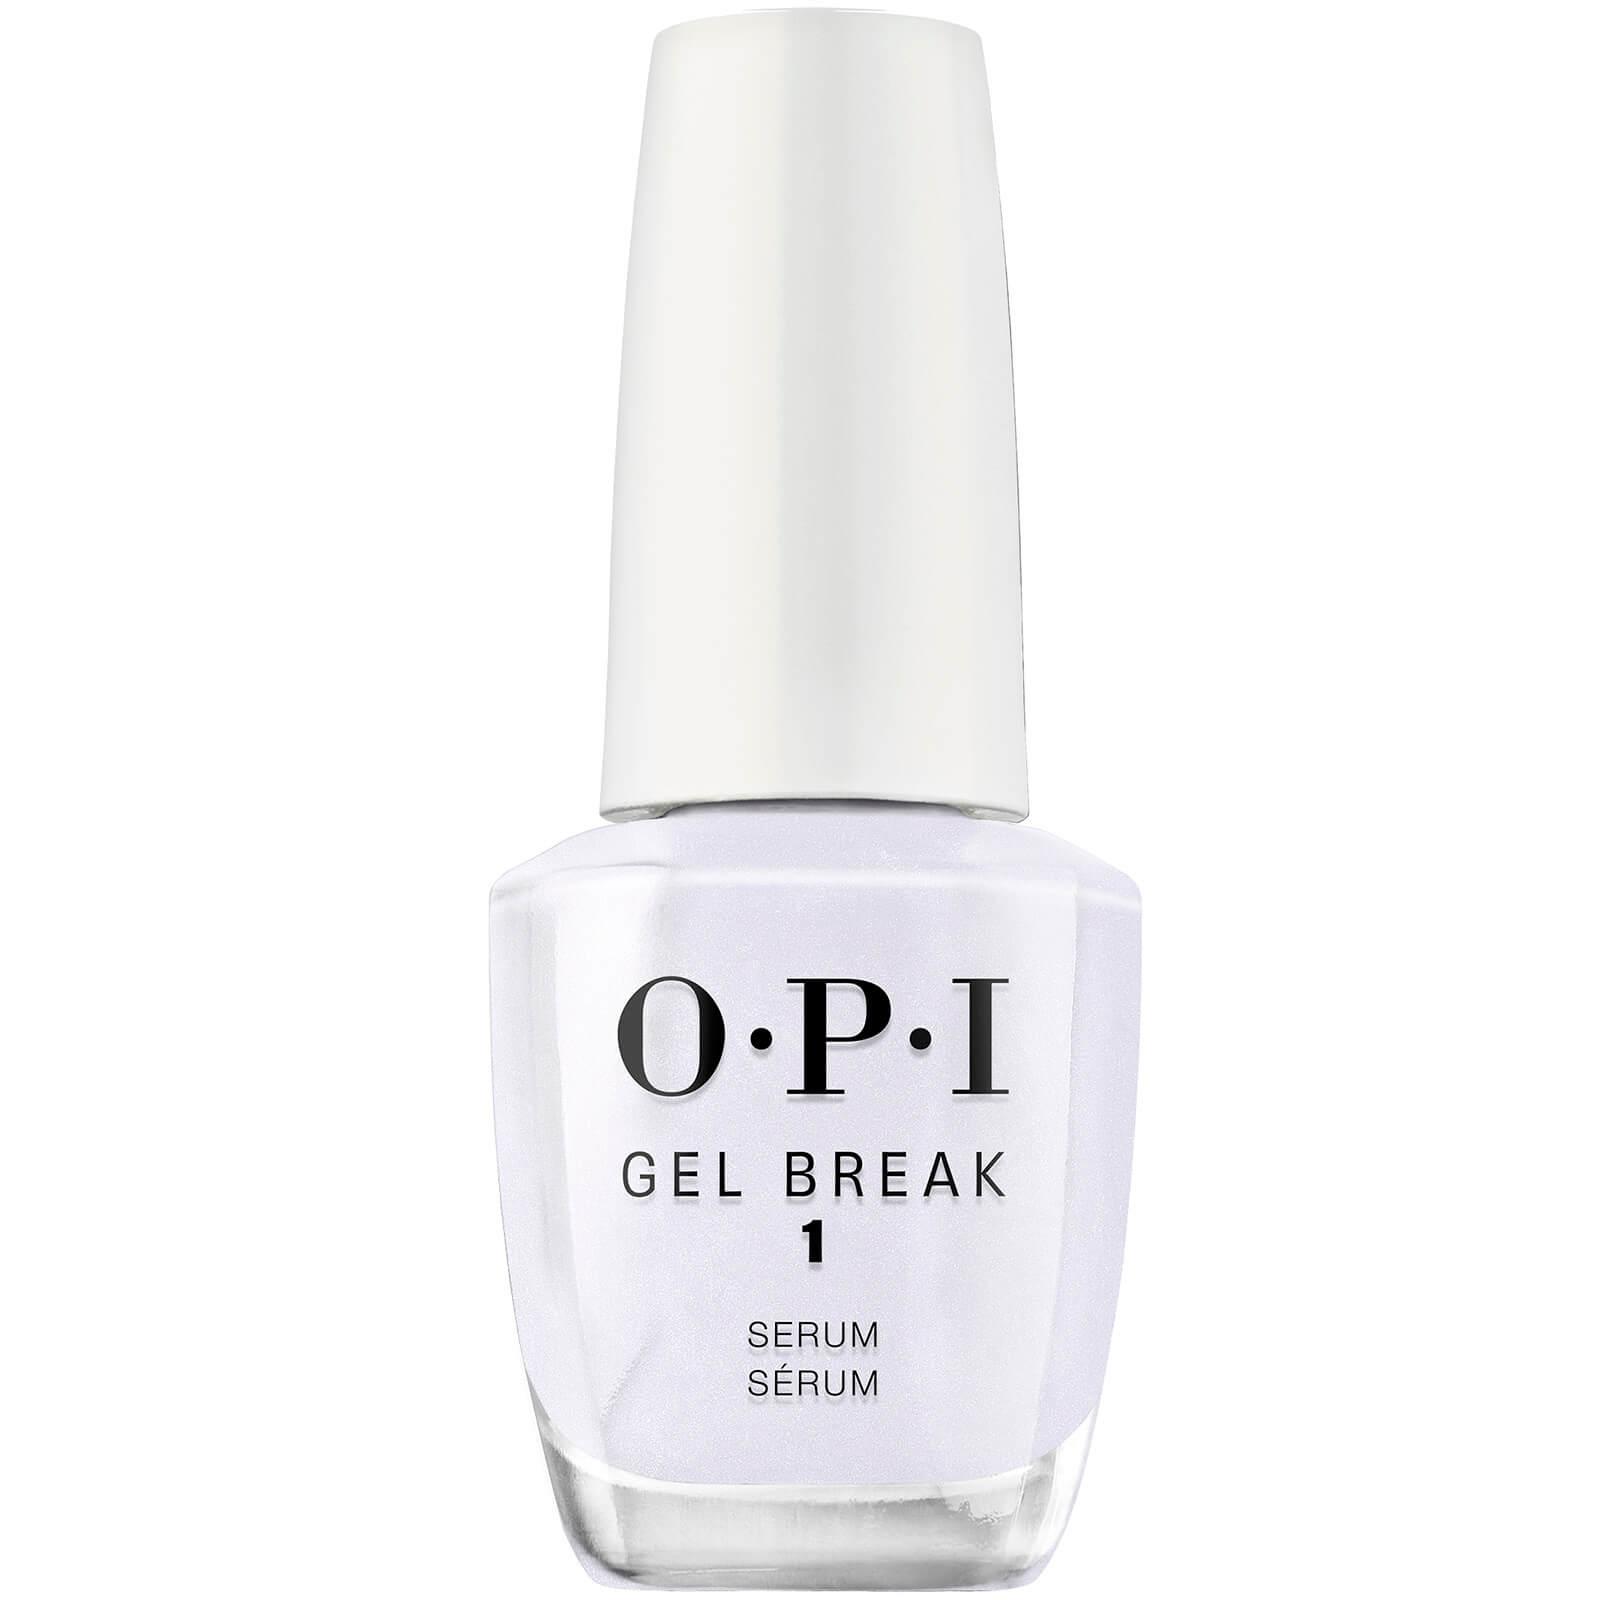 OPI Gel Break Serum-Infused Base Coat Clear 15ml